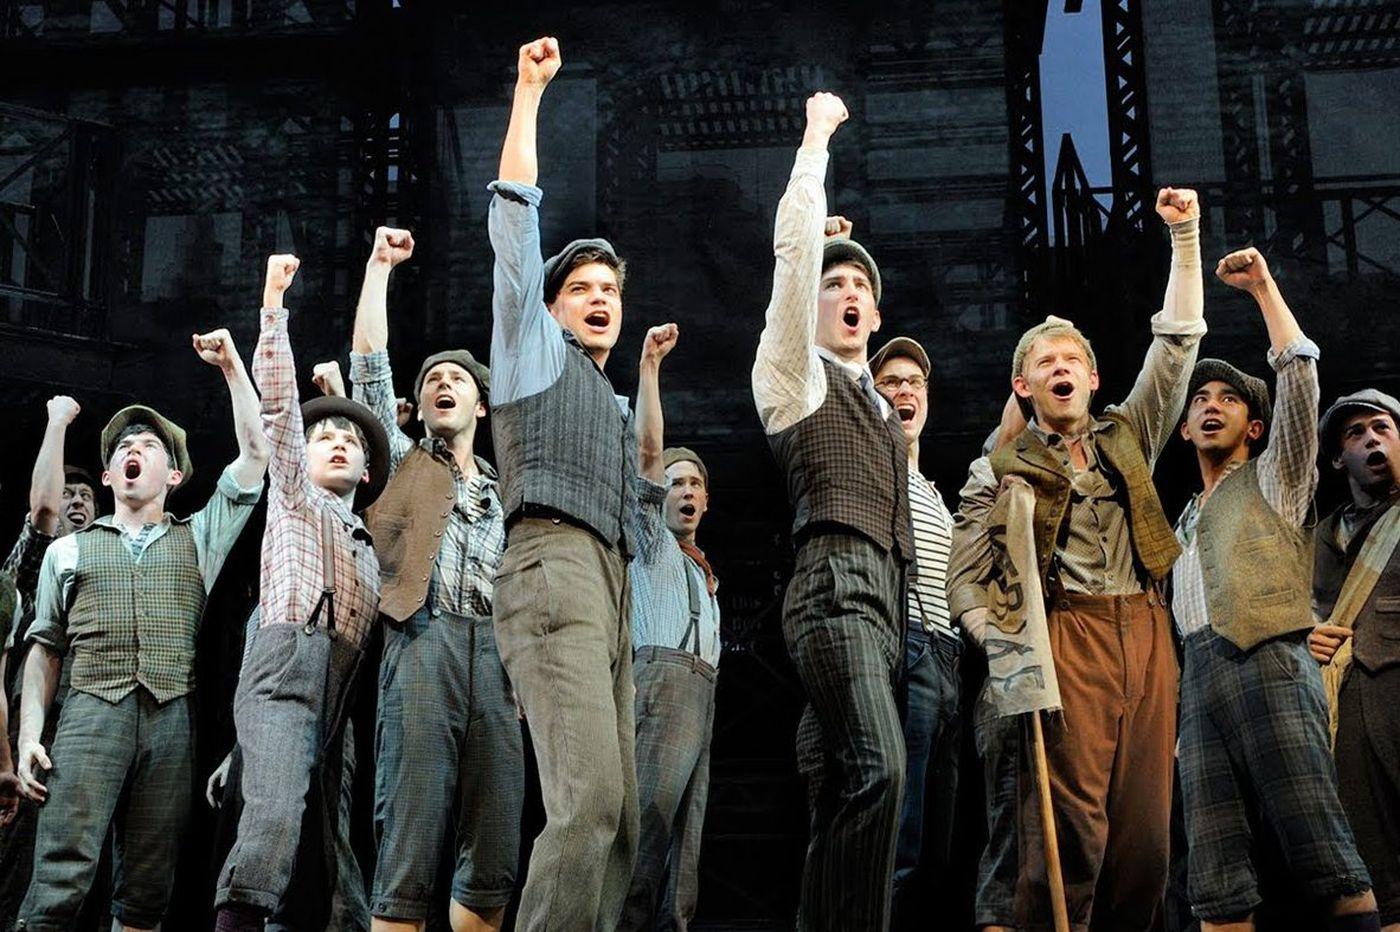 St. Joe's Prep lands rare high school production of 'Newsies'